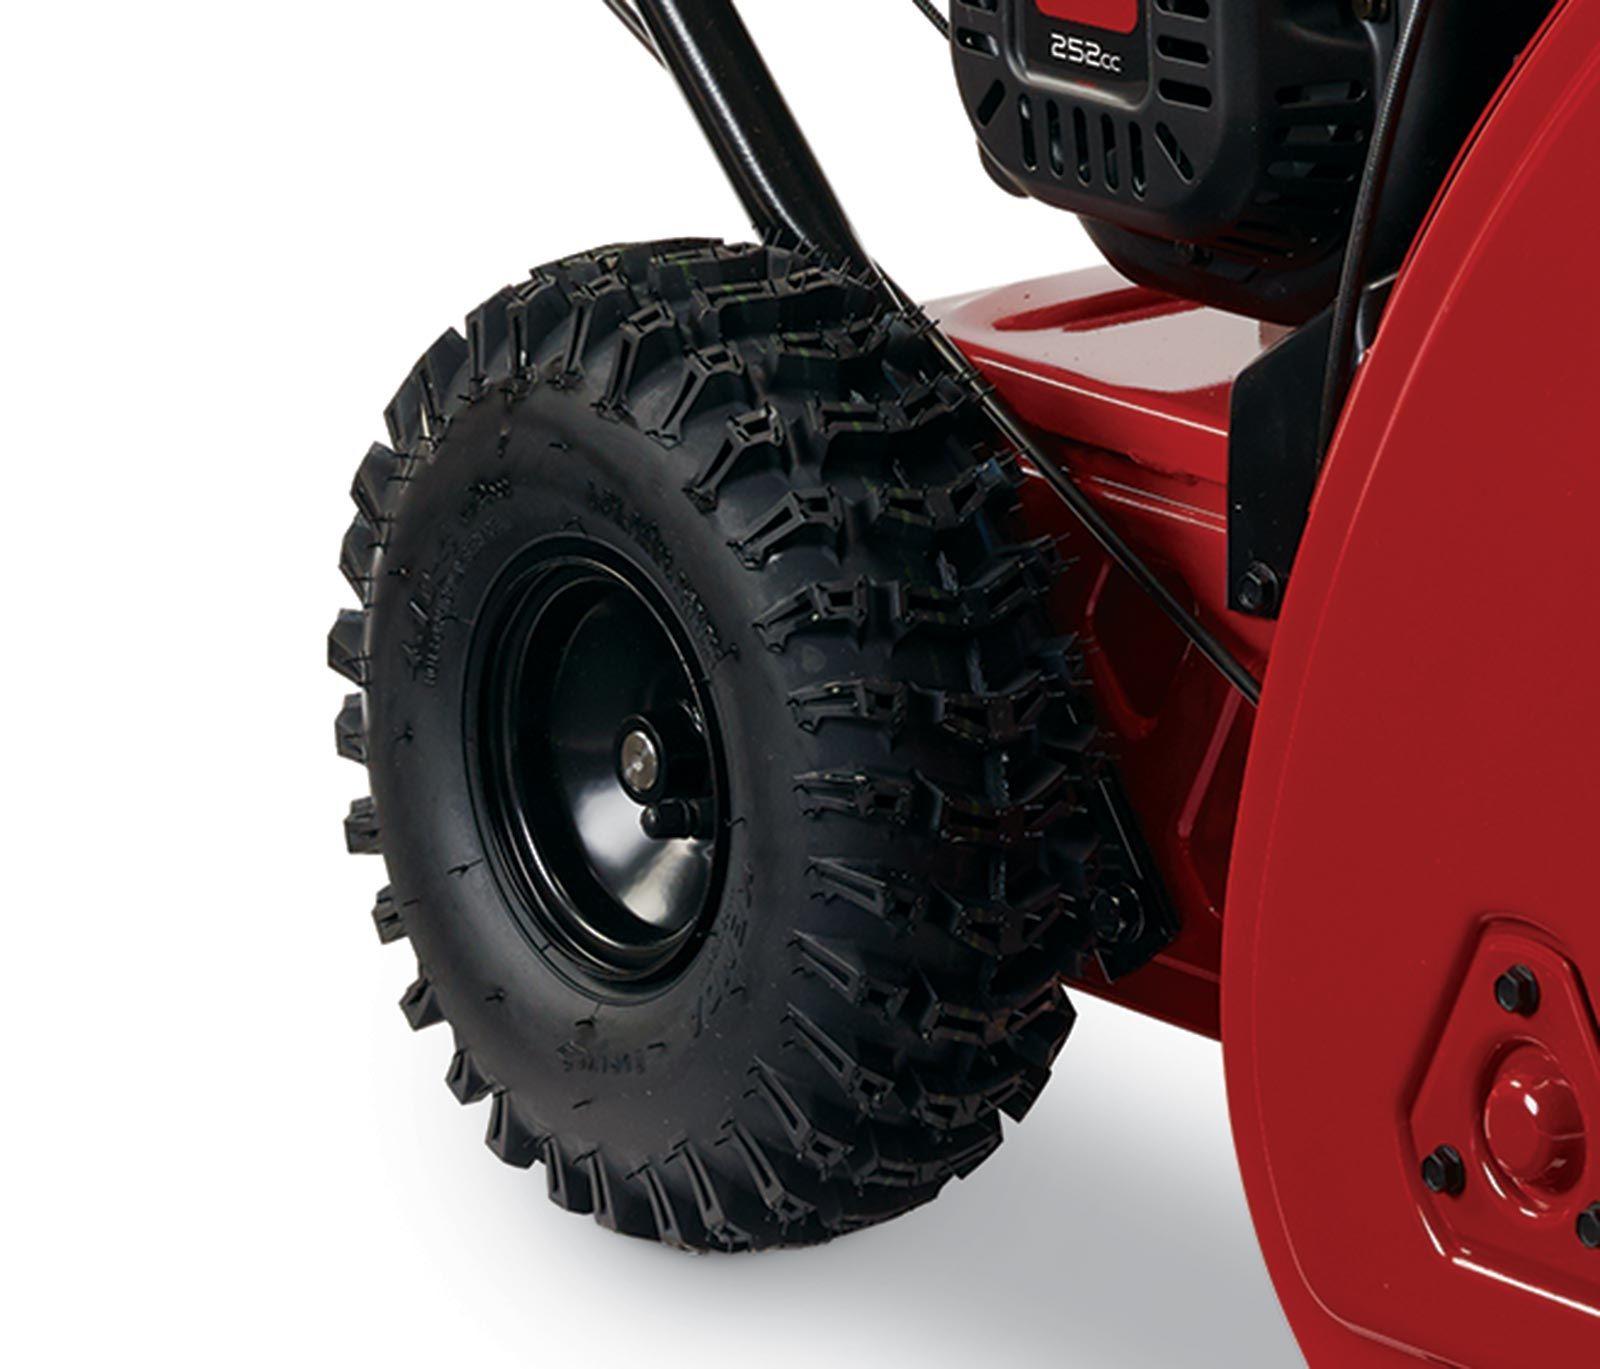 Toro Snowmaster 36002 11 inch deep lug tires - Directional deep lug wheels for added traction.